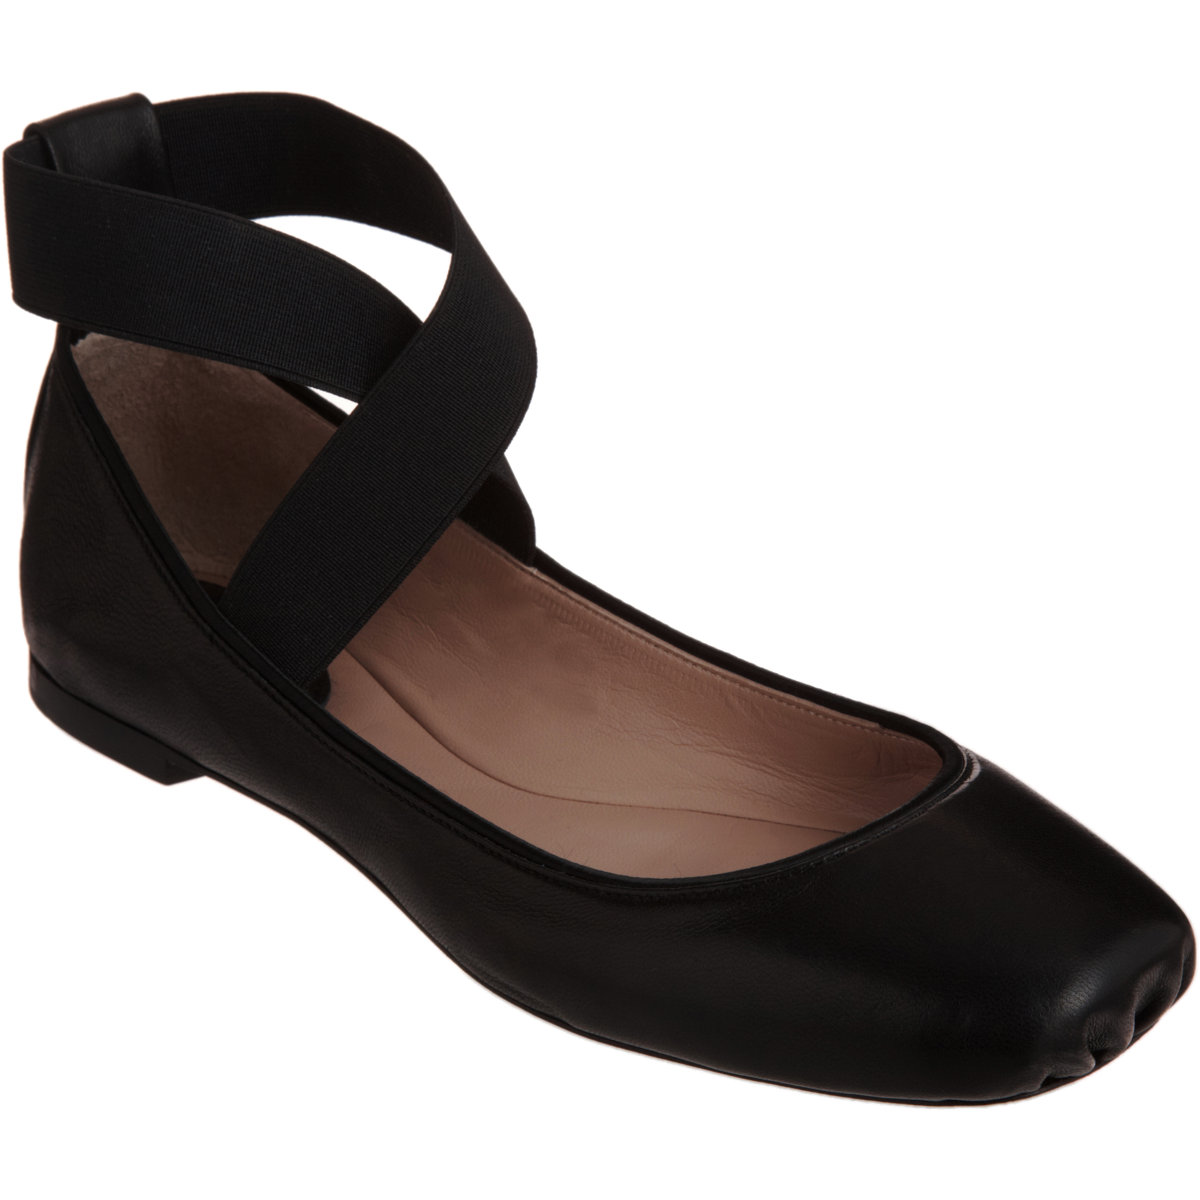 Black Valentino Flat Shoes